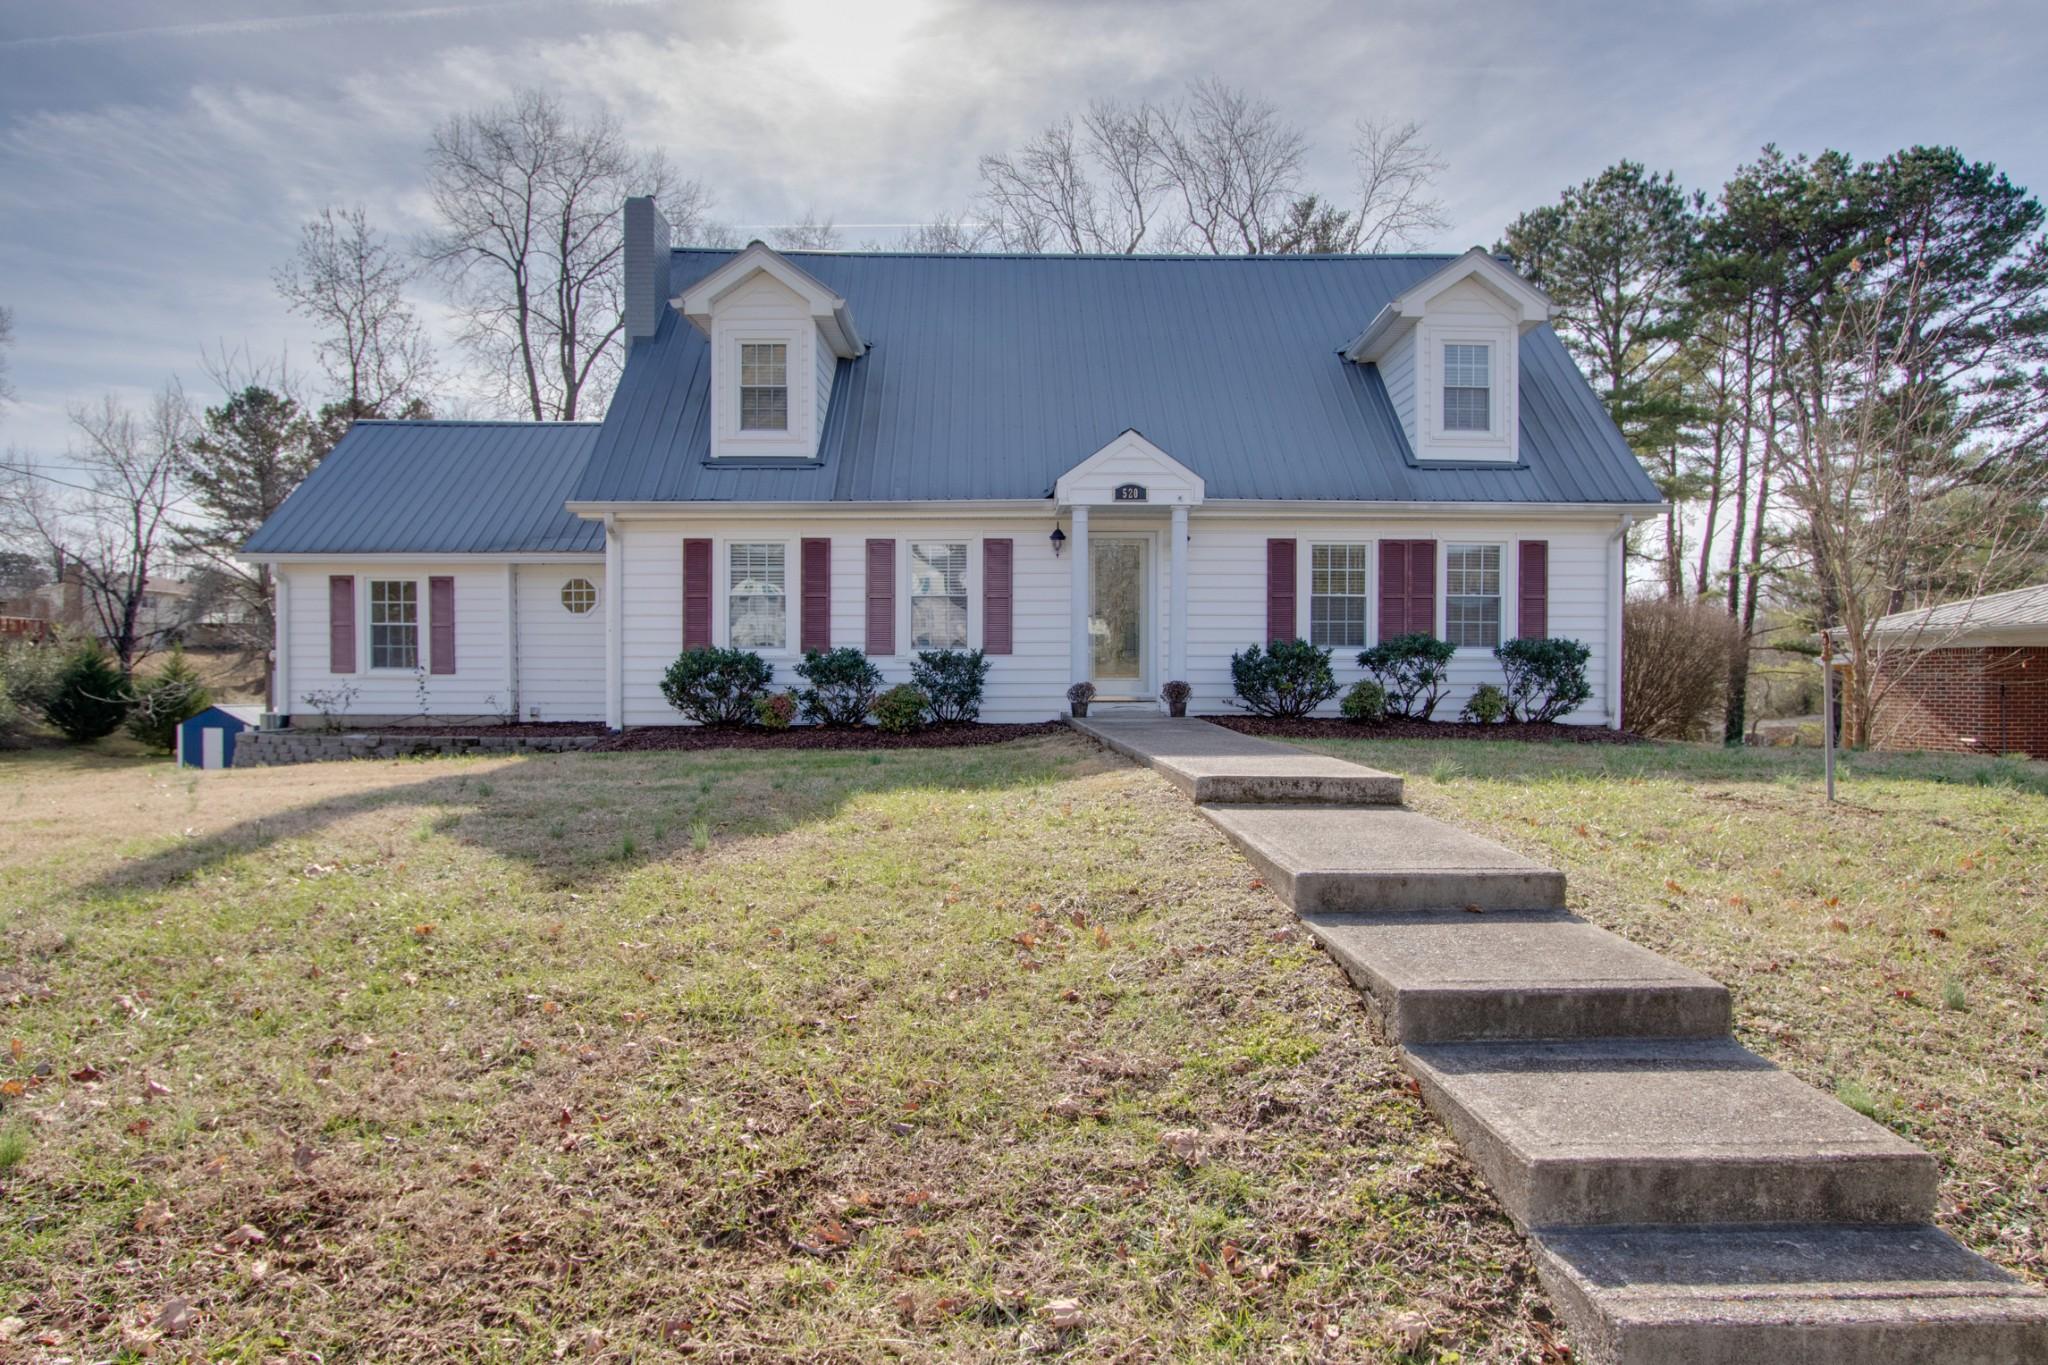 520 Jackson Ave, Carthage, TN 37030 - Carthage, TN real estate listing